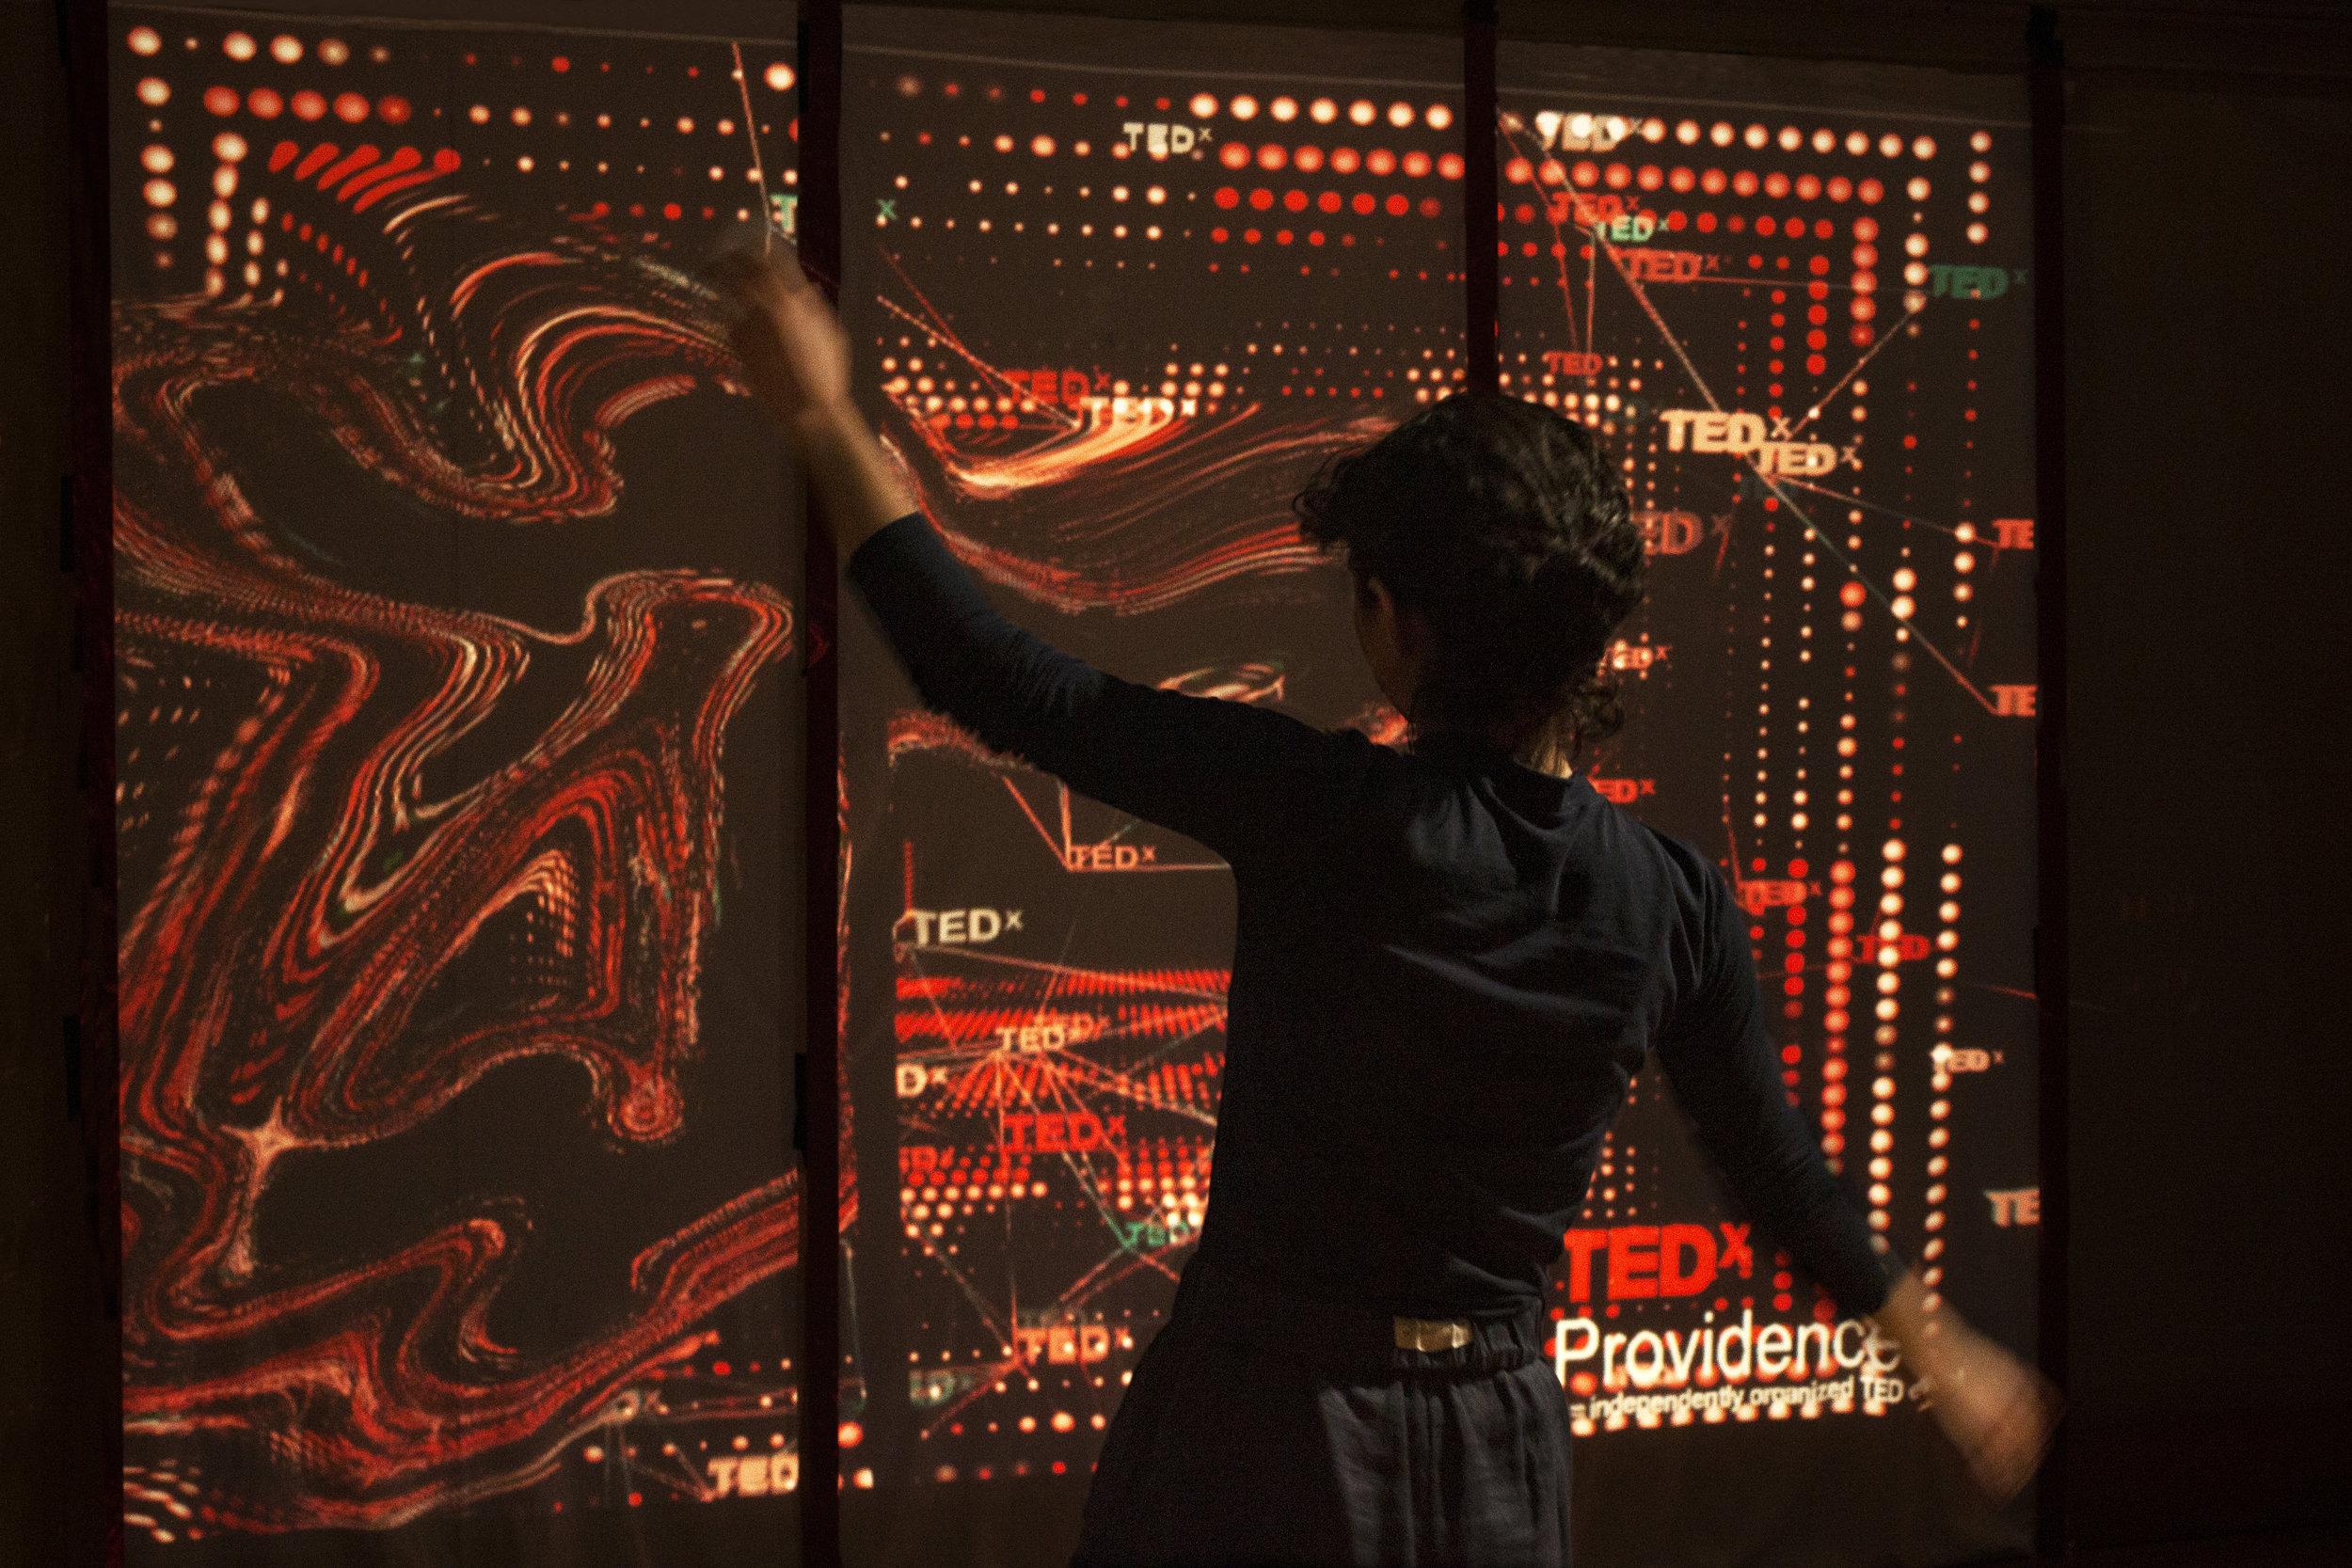 TEDx image 1.jpg